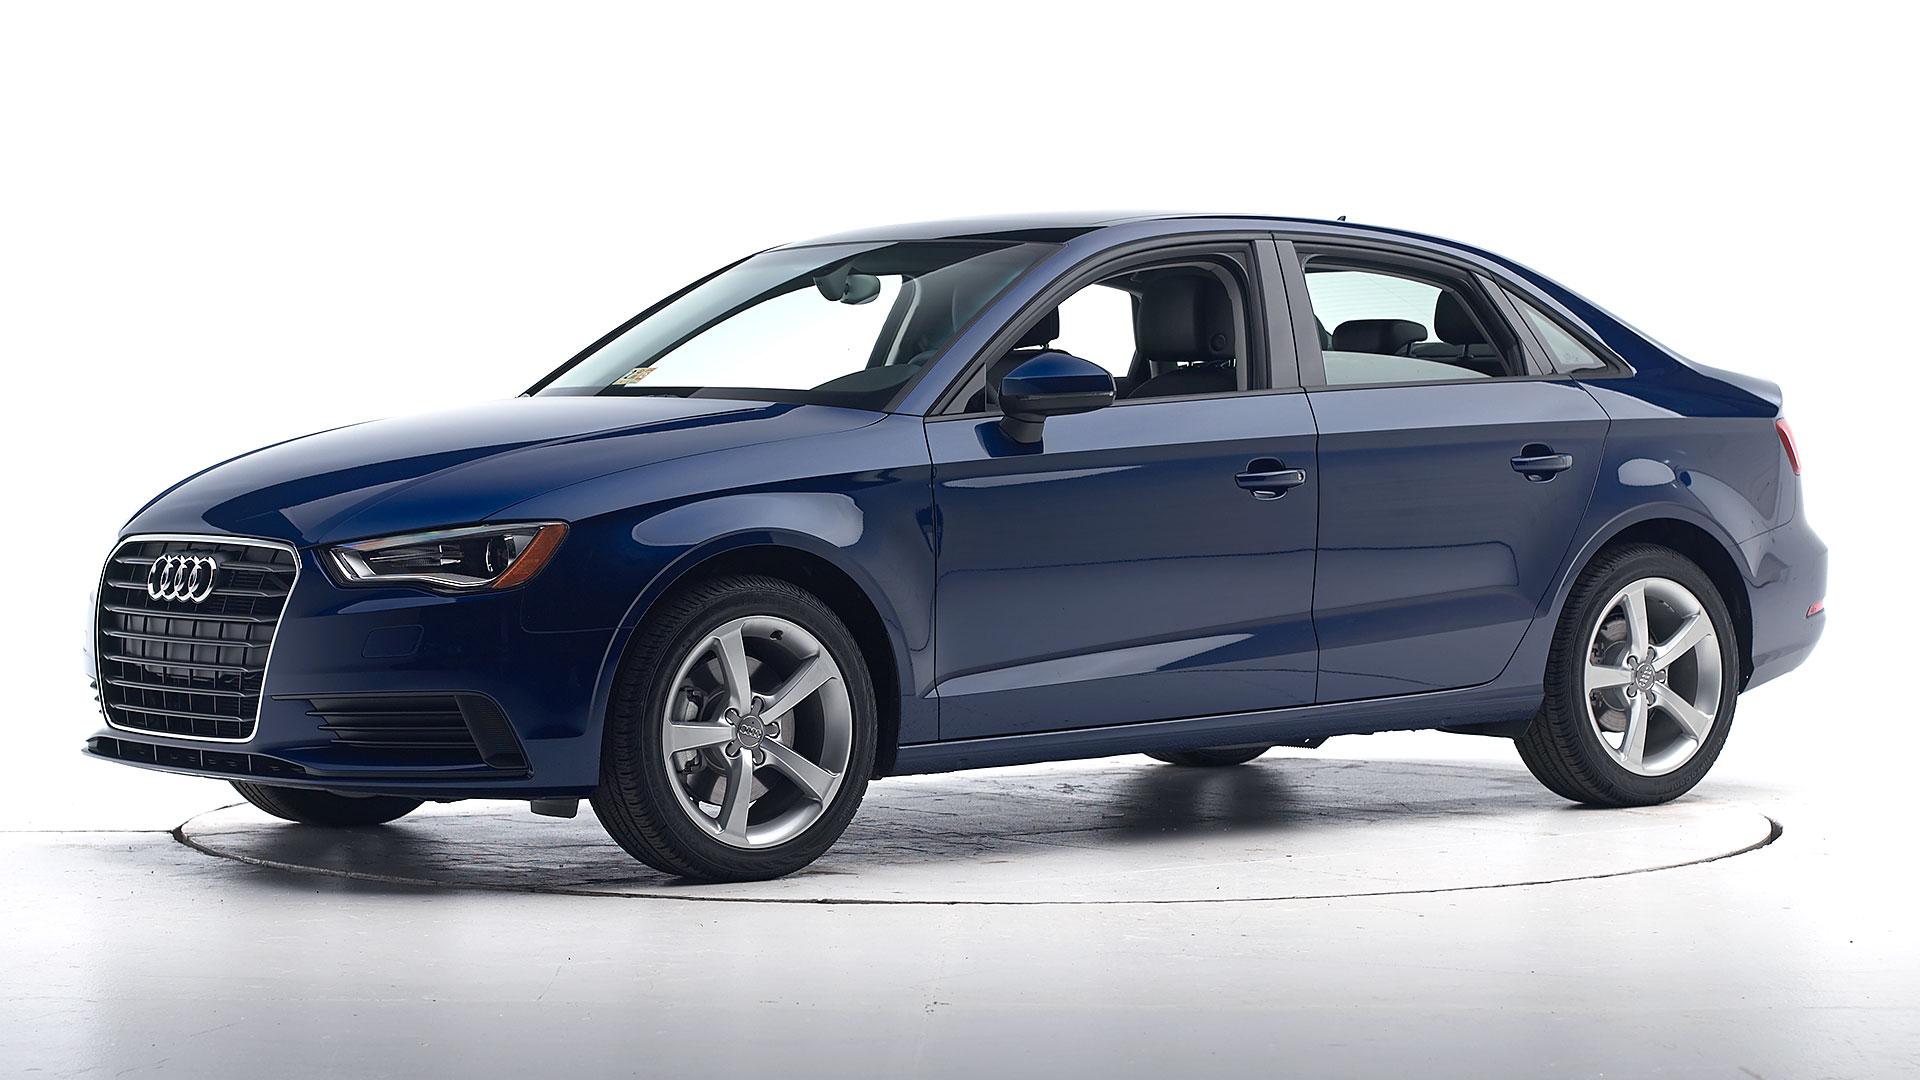 Kelebihan Kekurangan Audi A3 2015 Murah Berkualitas